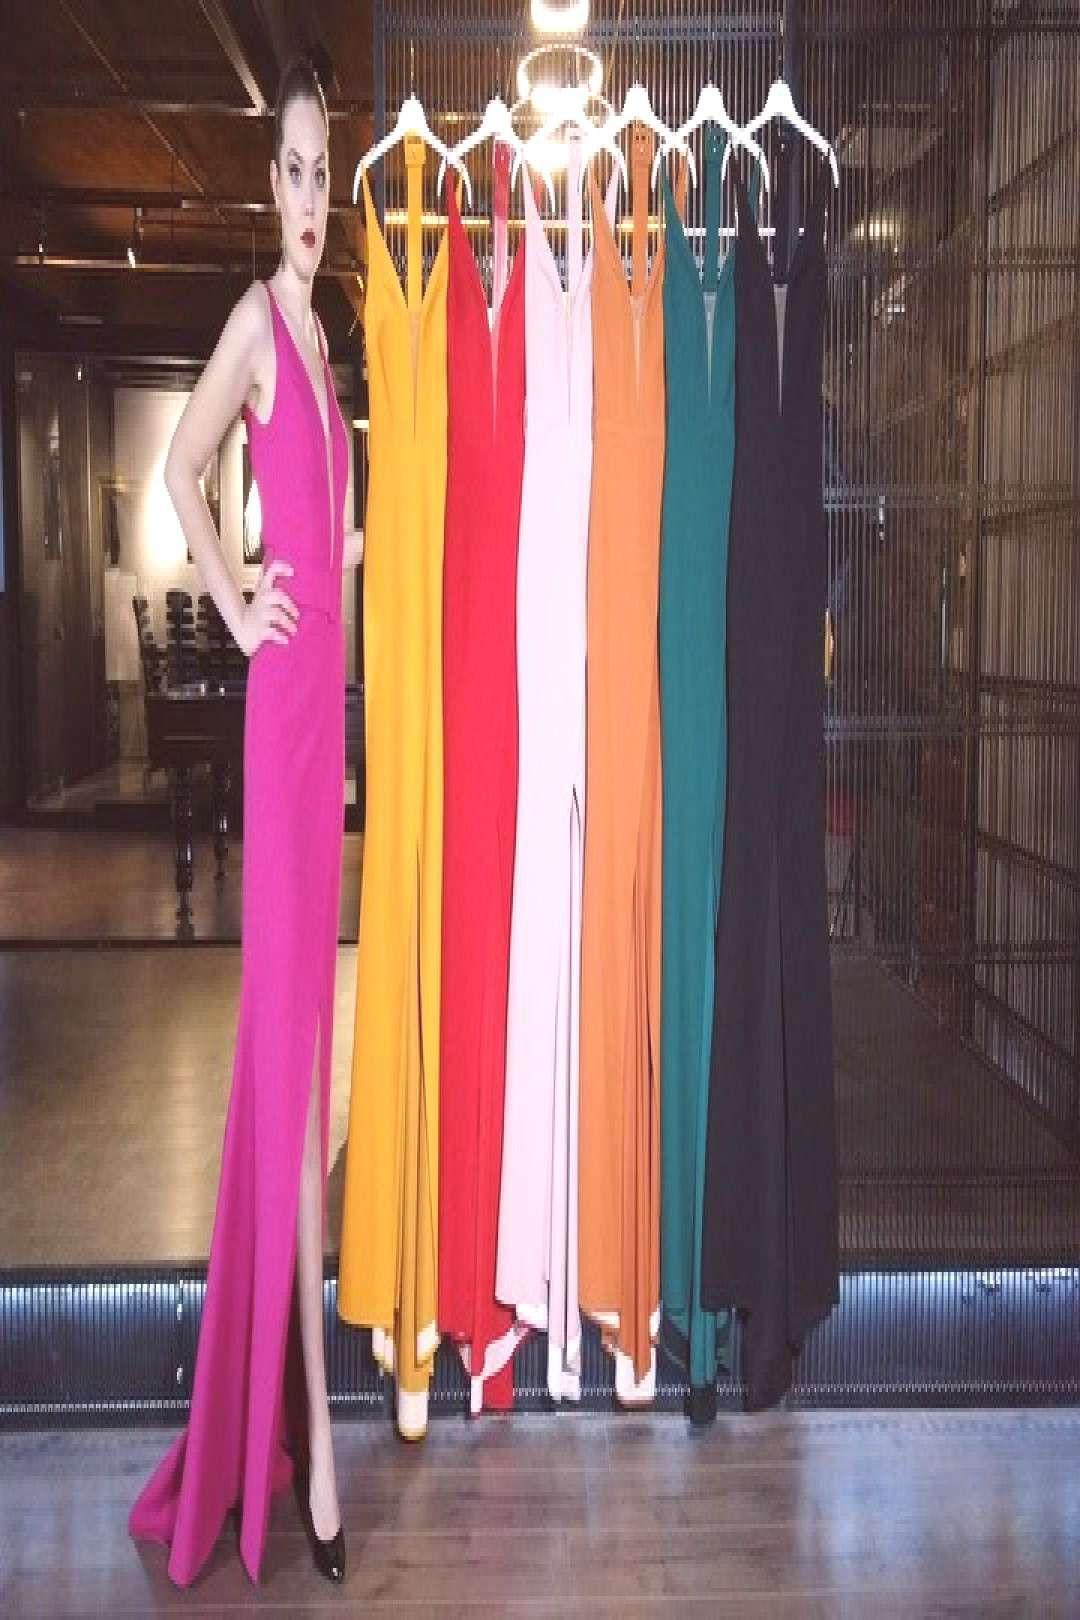 #birbirinden #renkleri #iciniz #snacak #retail #canl #whol #yaz #ile Birbirinden canlı yaz renkleri ile iciniz ısınacak Retail wholYou can find Fashion dresses and more on our website.Birbirinden canlı yaz renkleri ile iciniz ısınacak Retail...